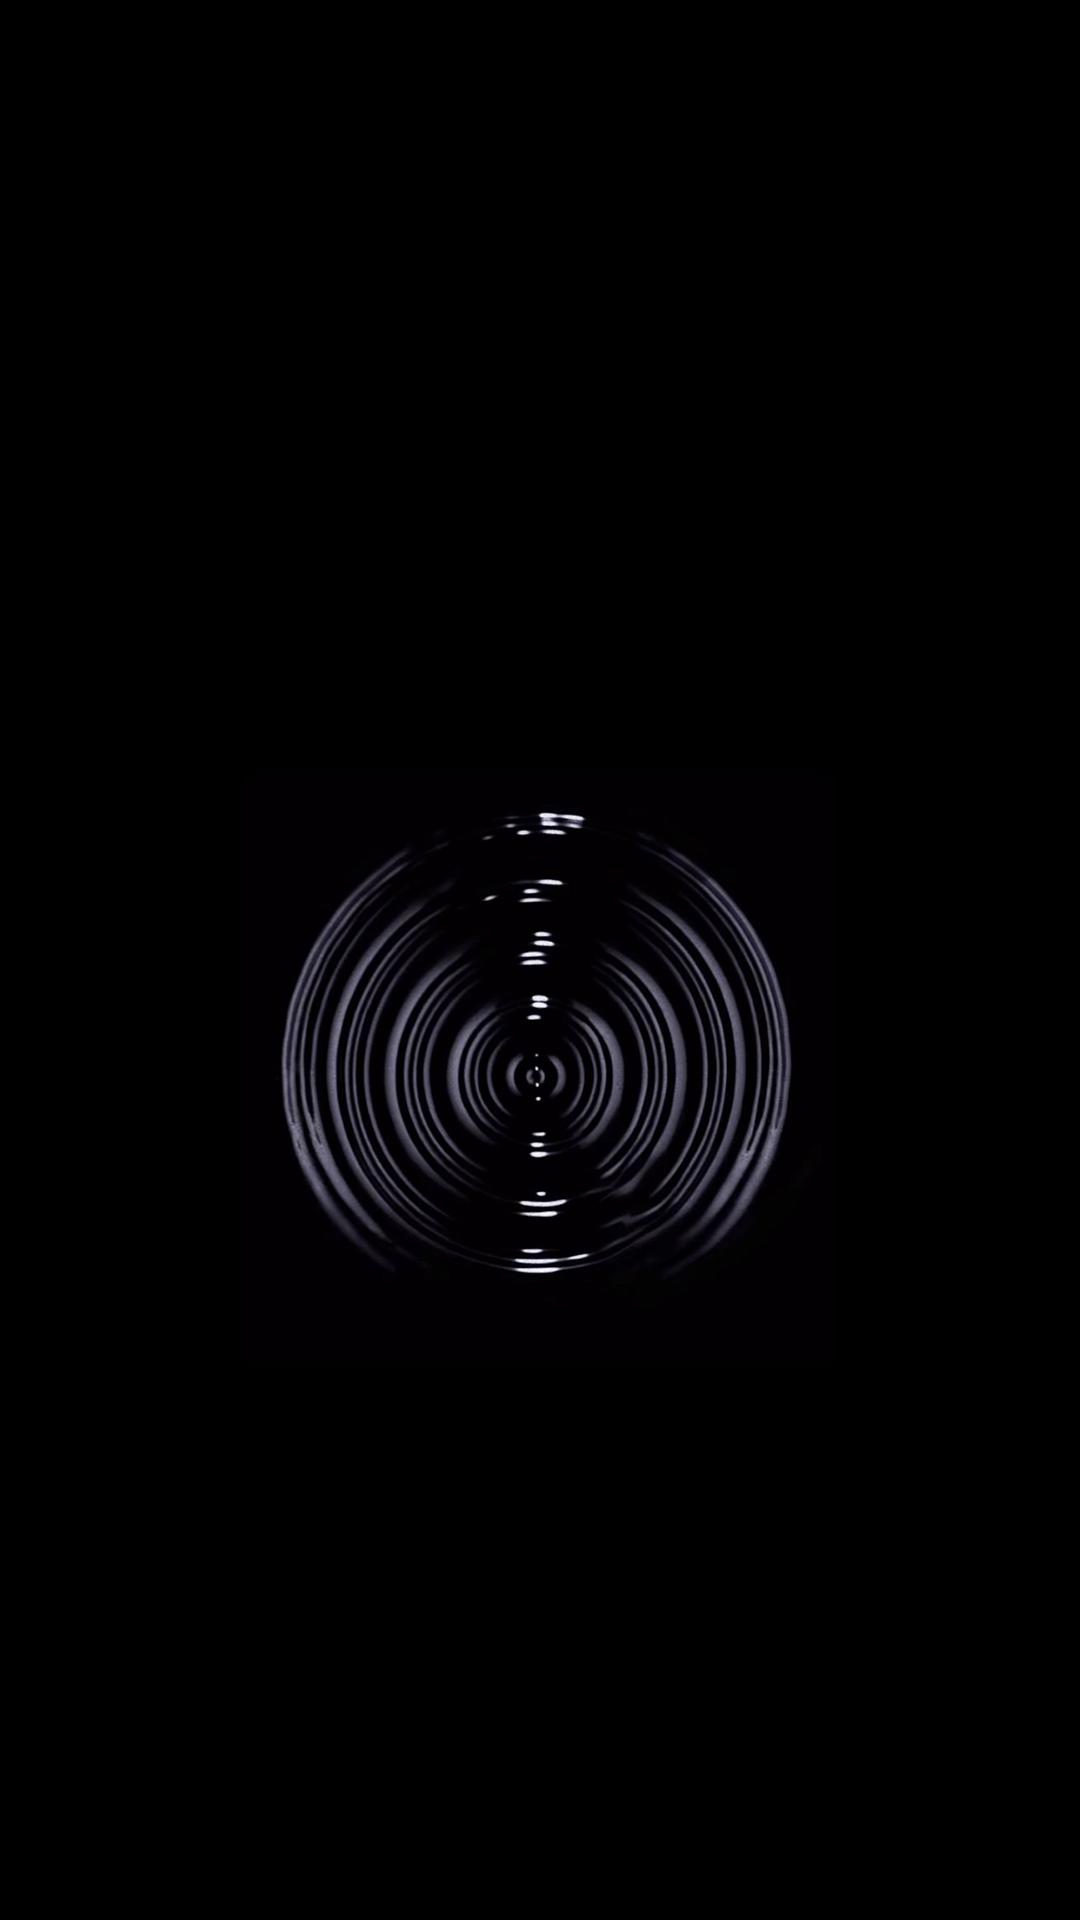 dark-wallpaper-applifevn-1